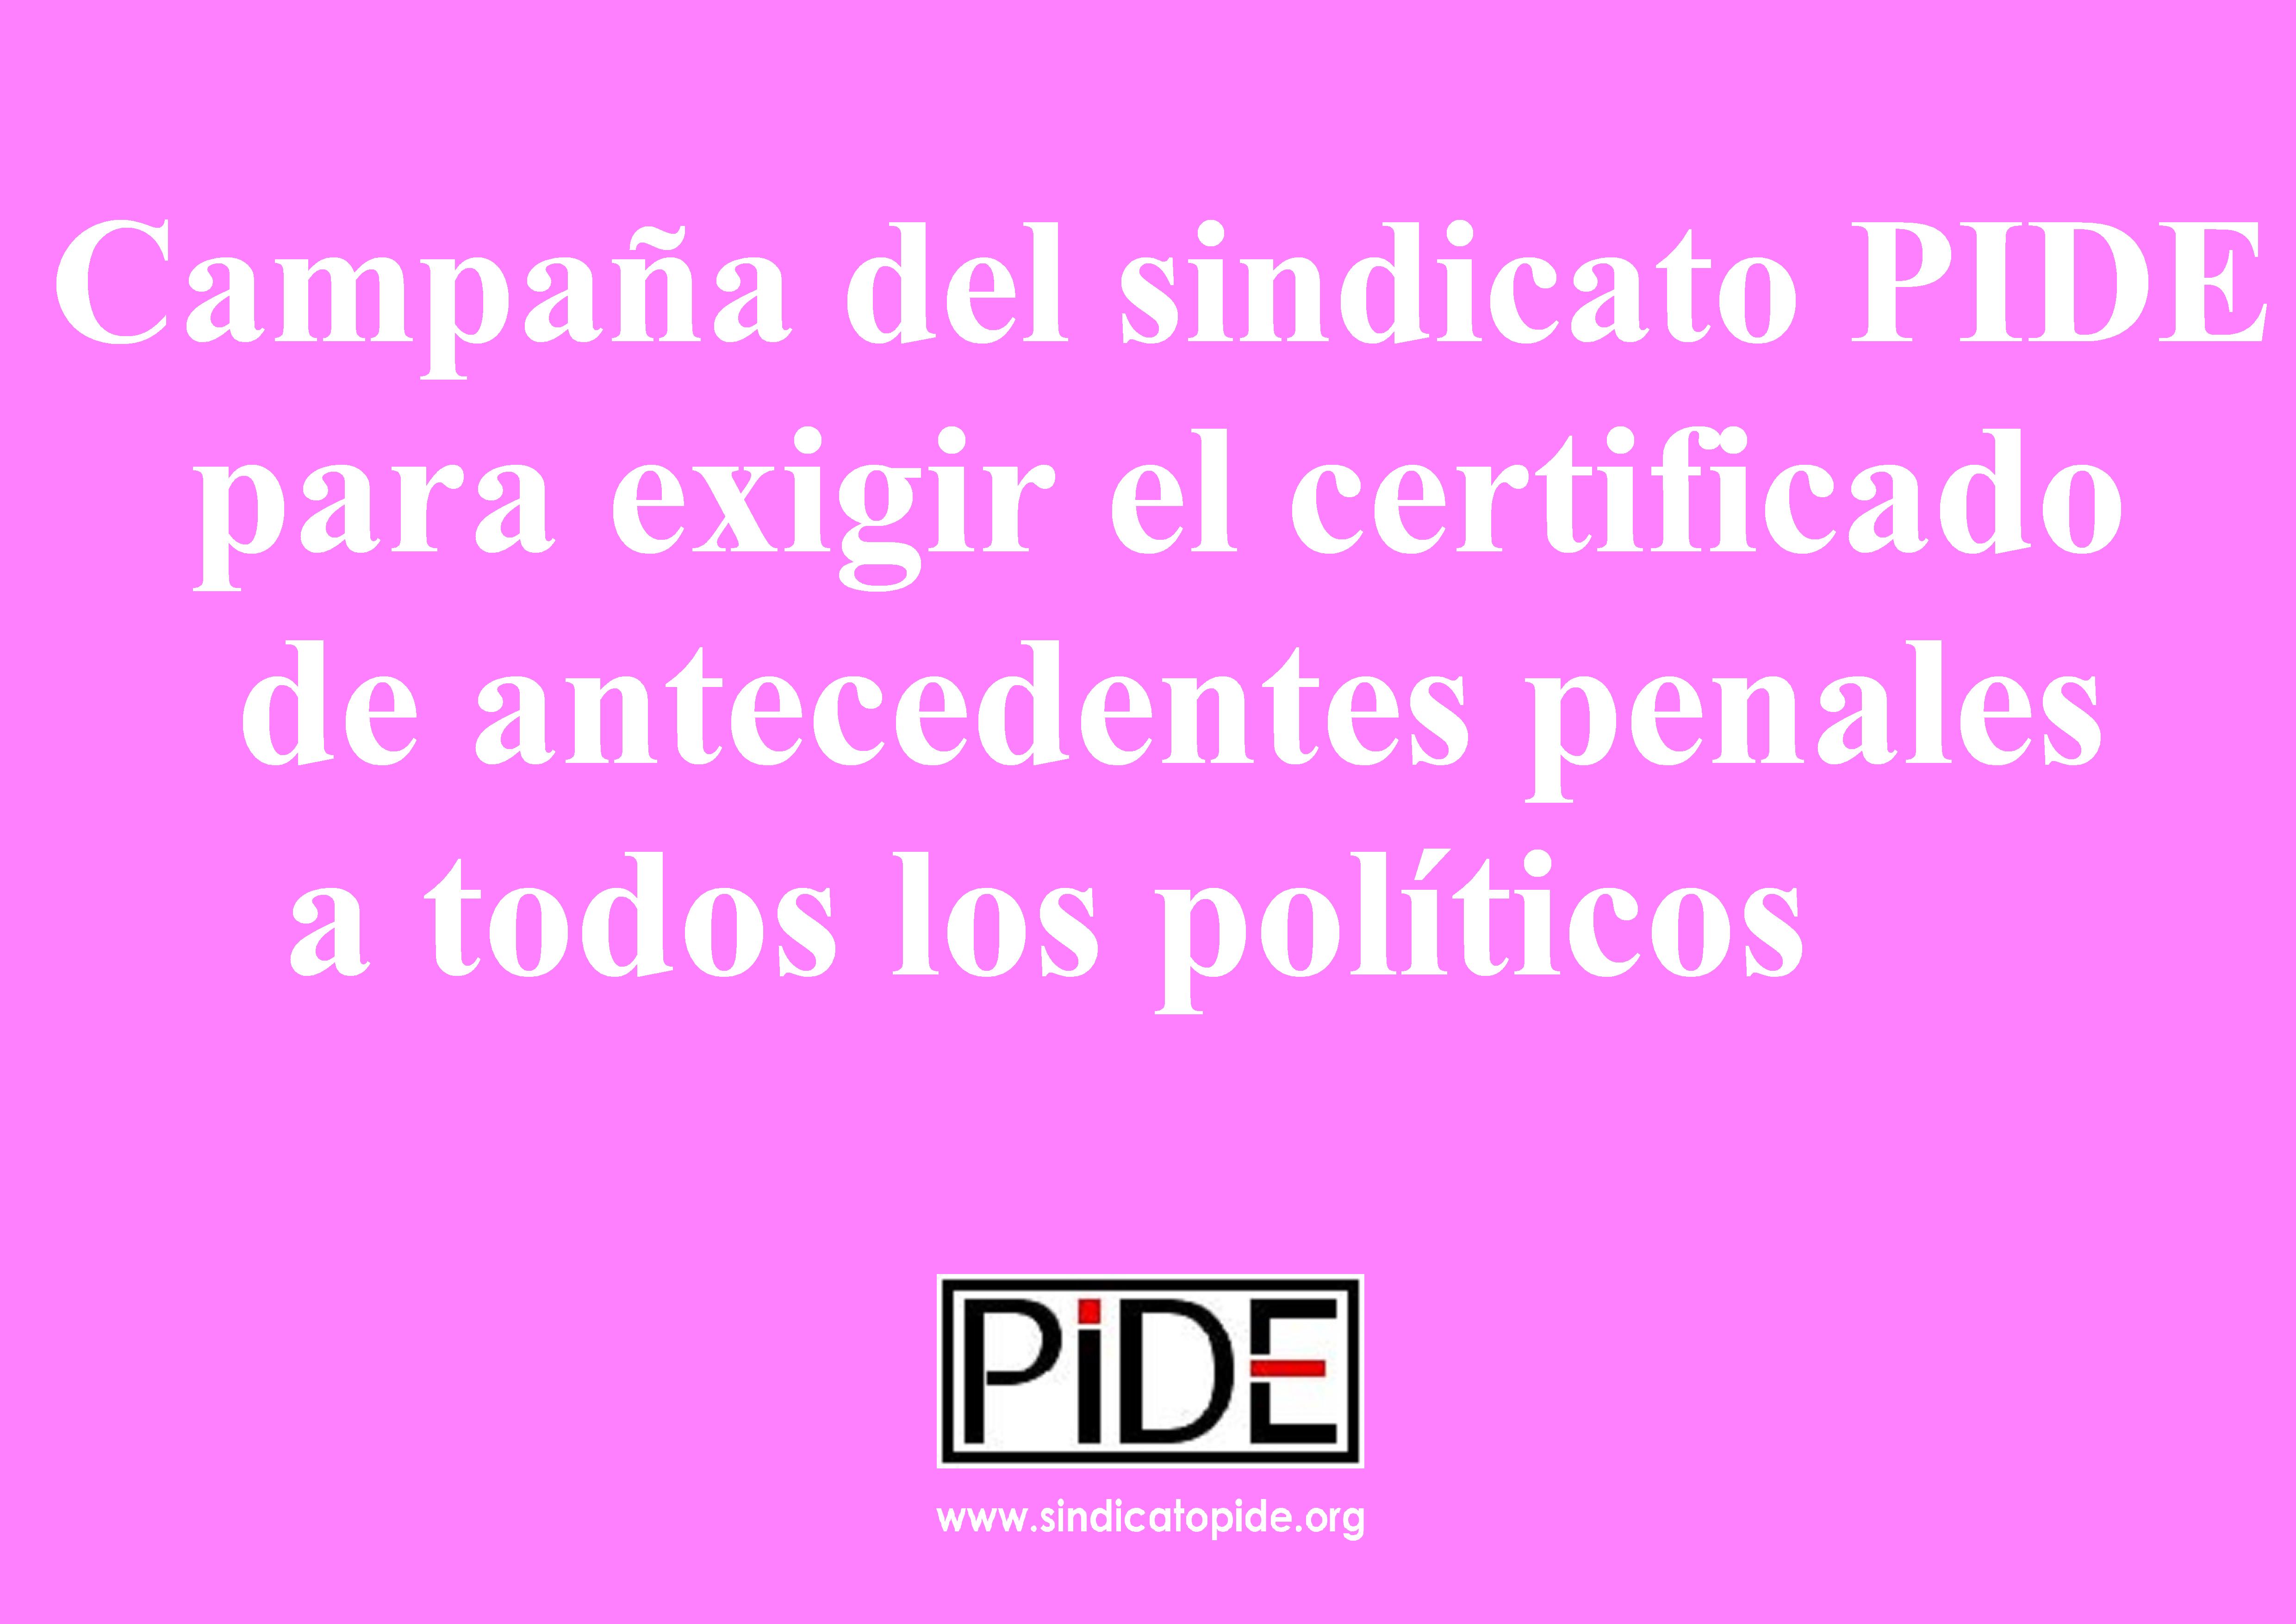 CartelCampañaPIDE_AntecPenalPol